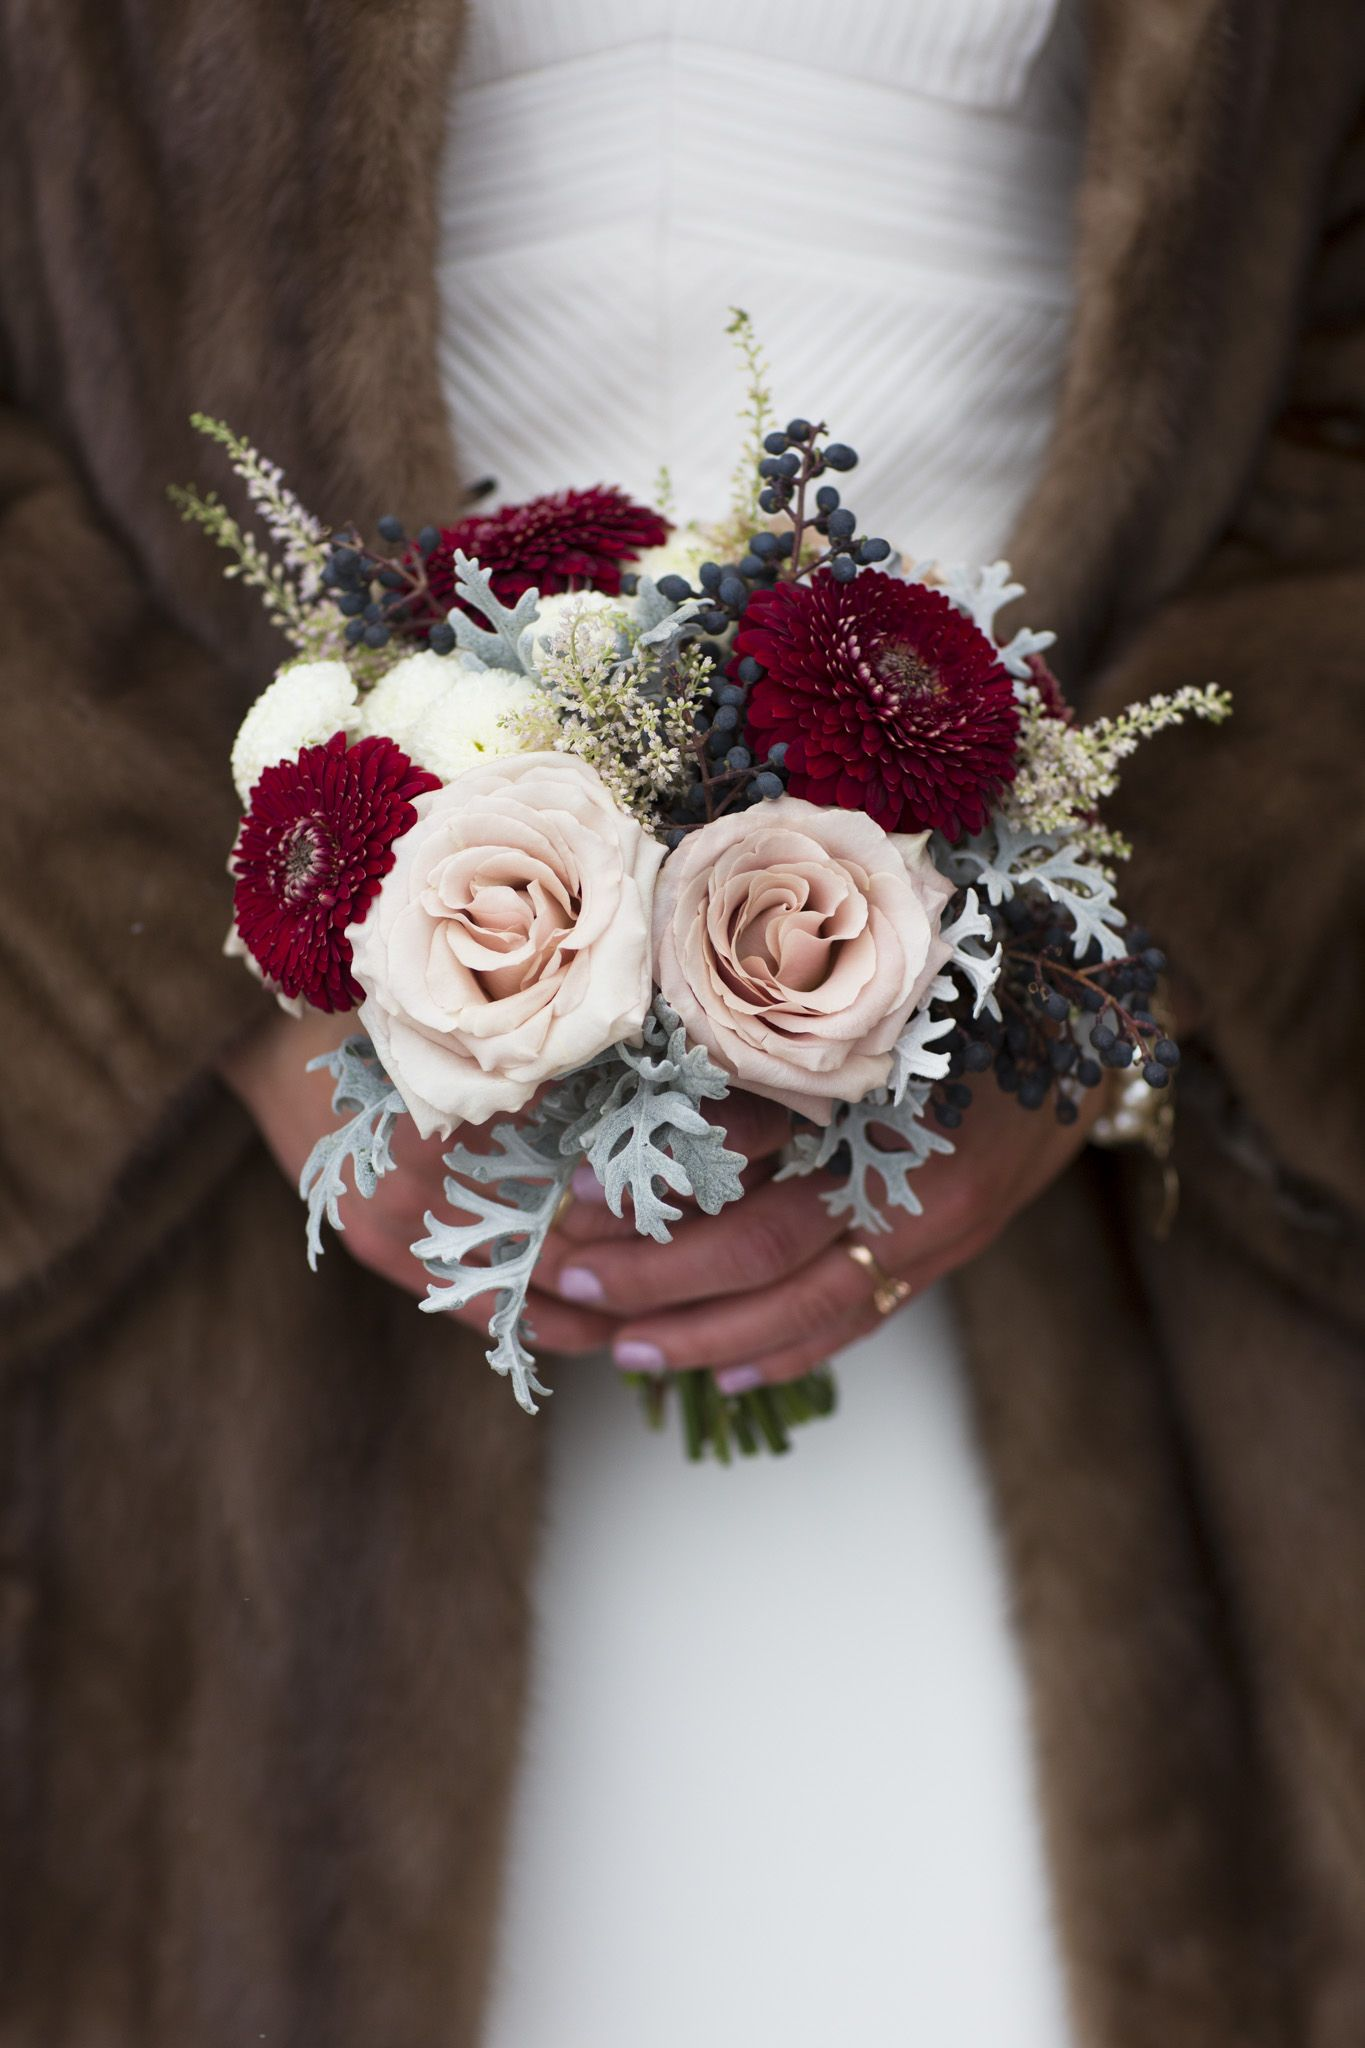 Winter Bridal Posy With Quicksand Roses Viburnum Berries Astilbe